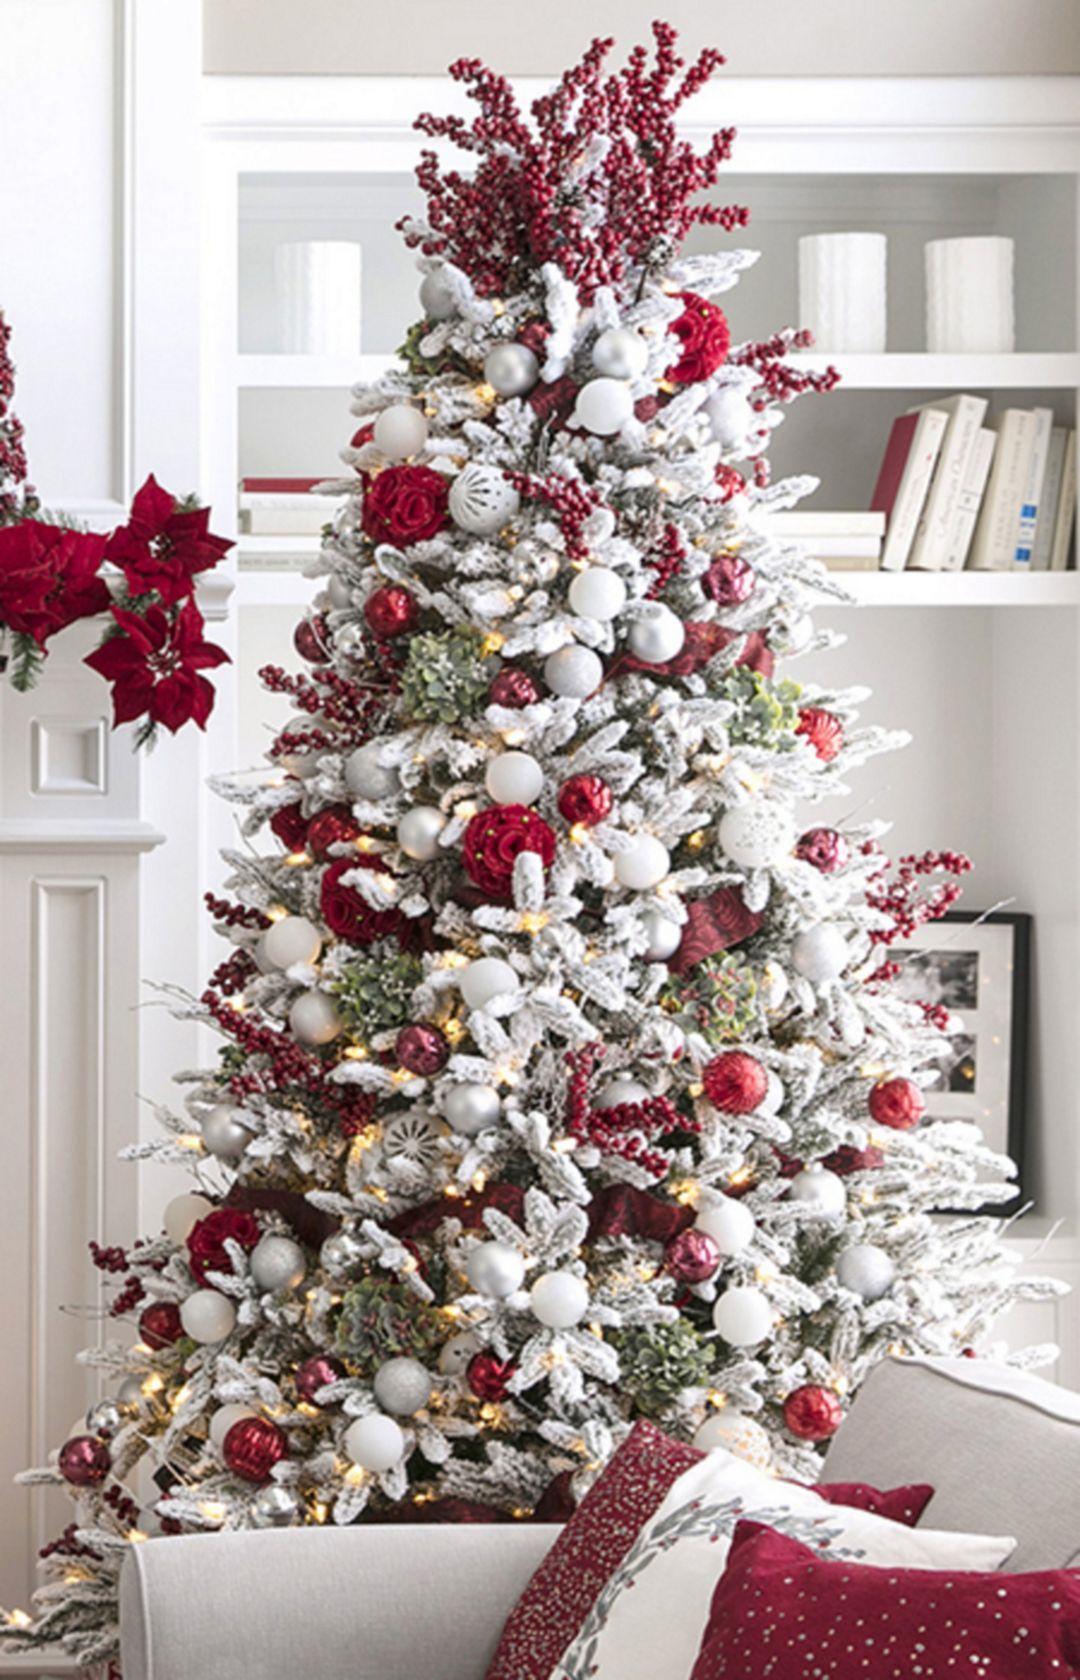 15+ Stunning Christmas Tree Decorations Ideas For Inspiration #christmastreeideas